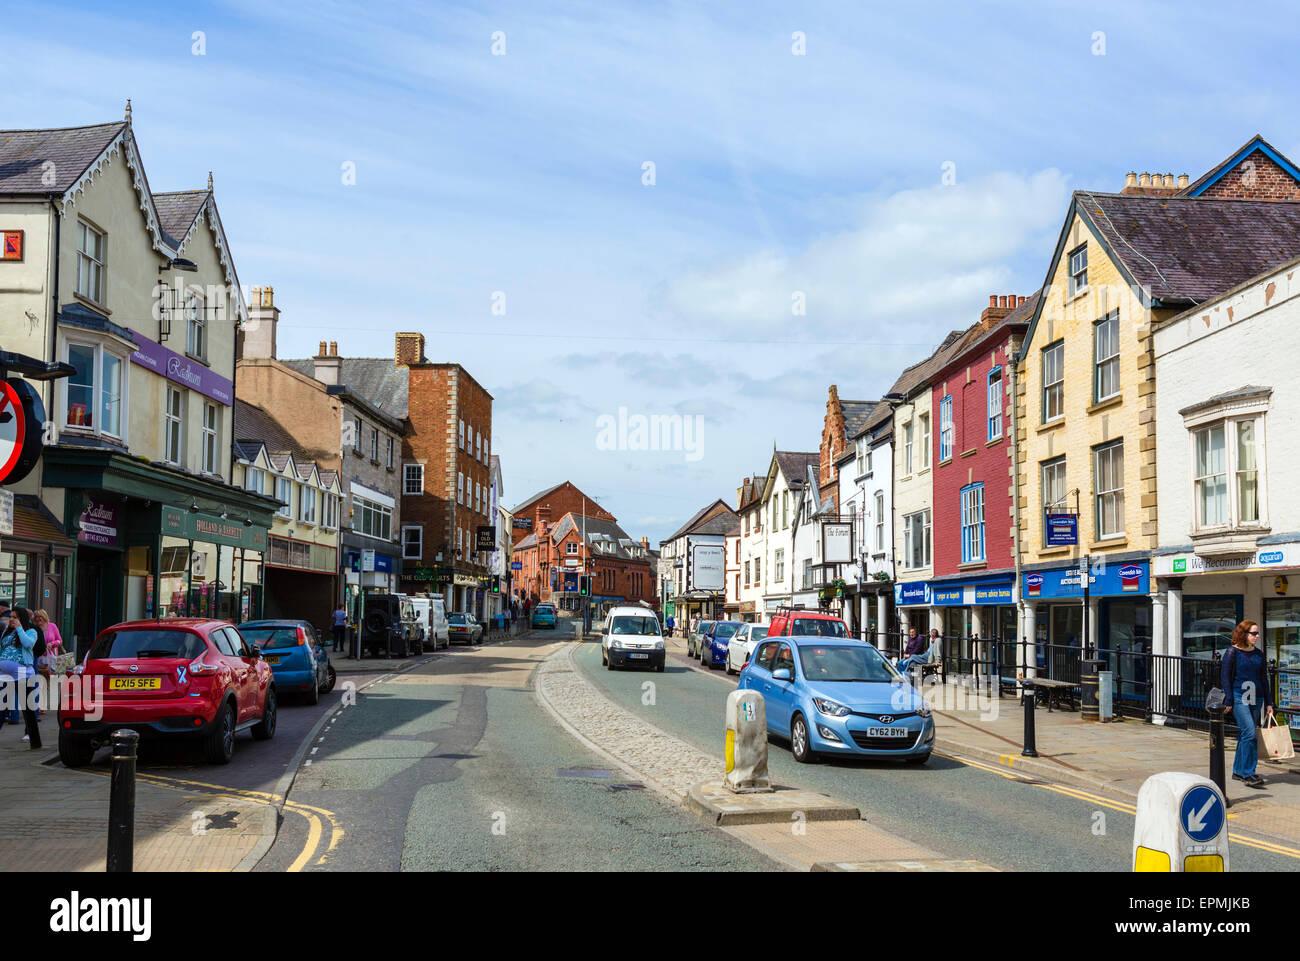 High Street in Denbigh, Denbighshire, Wales, UK Stockbild